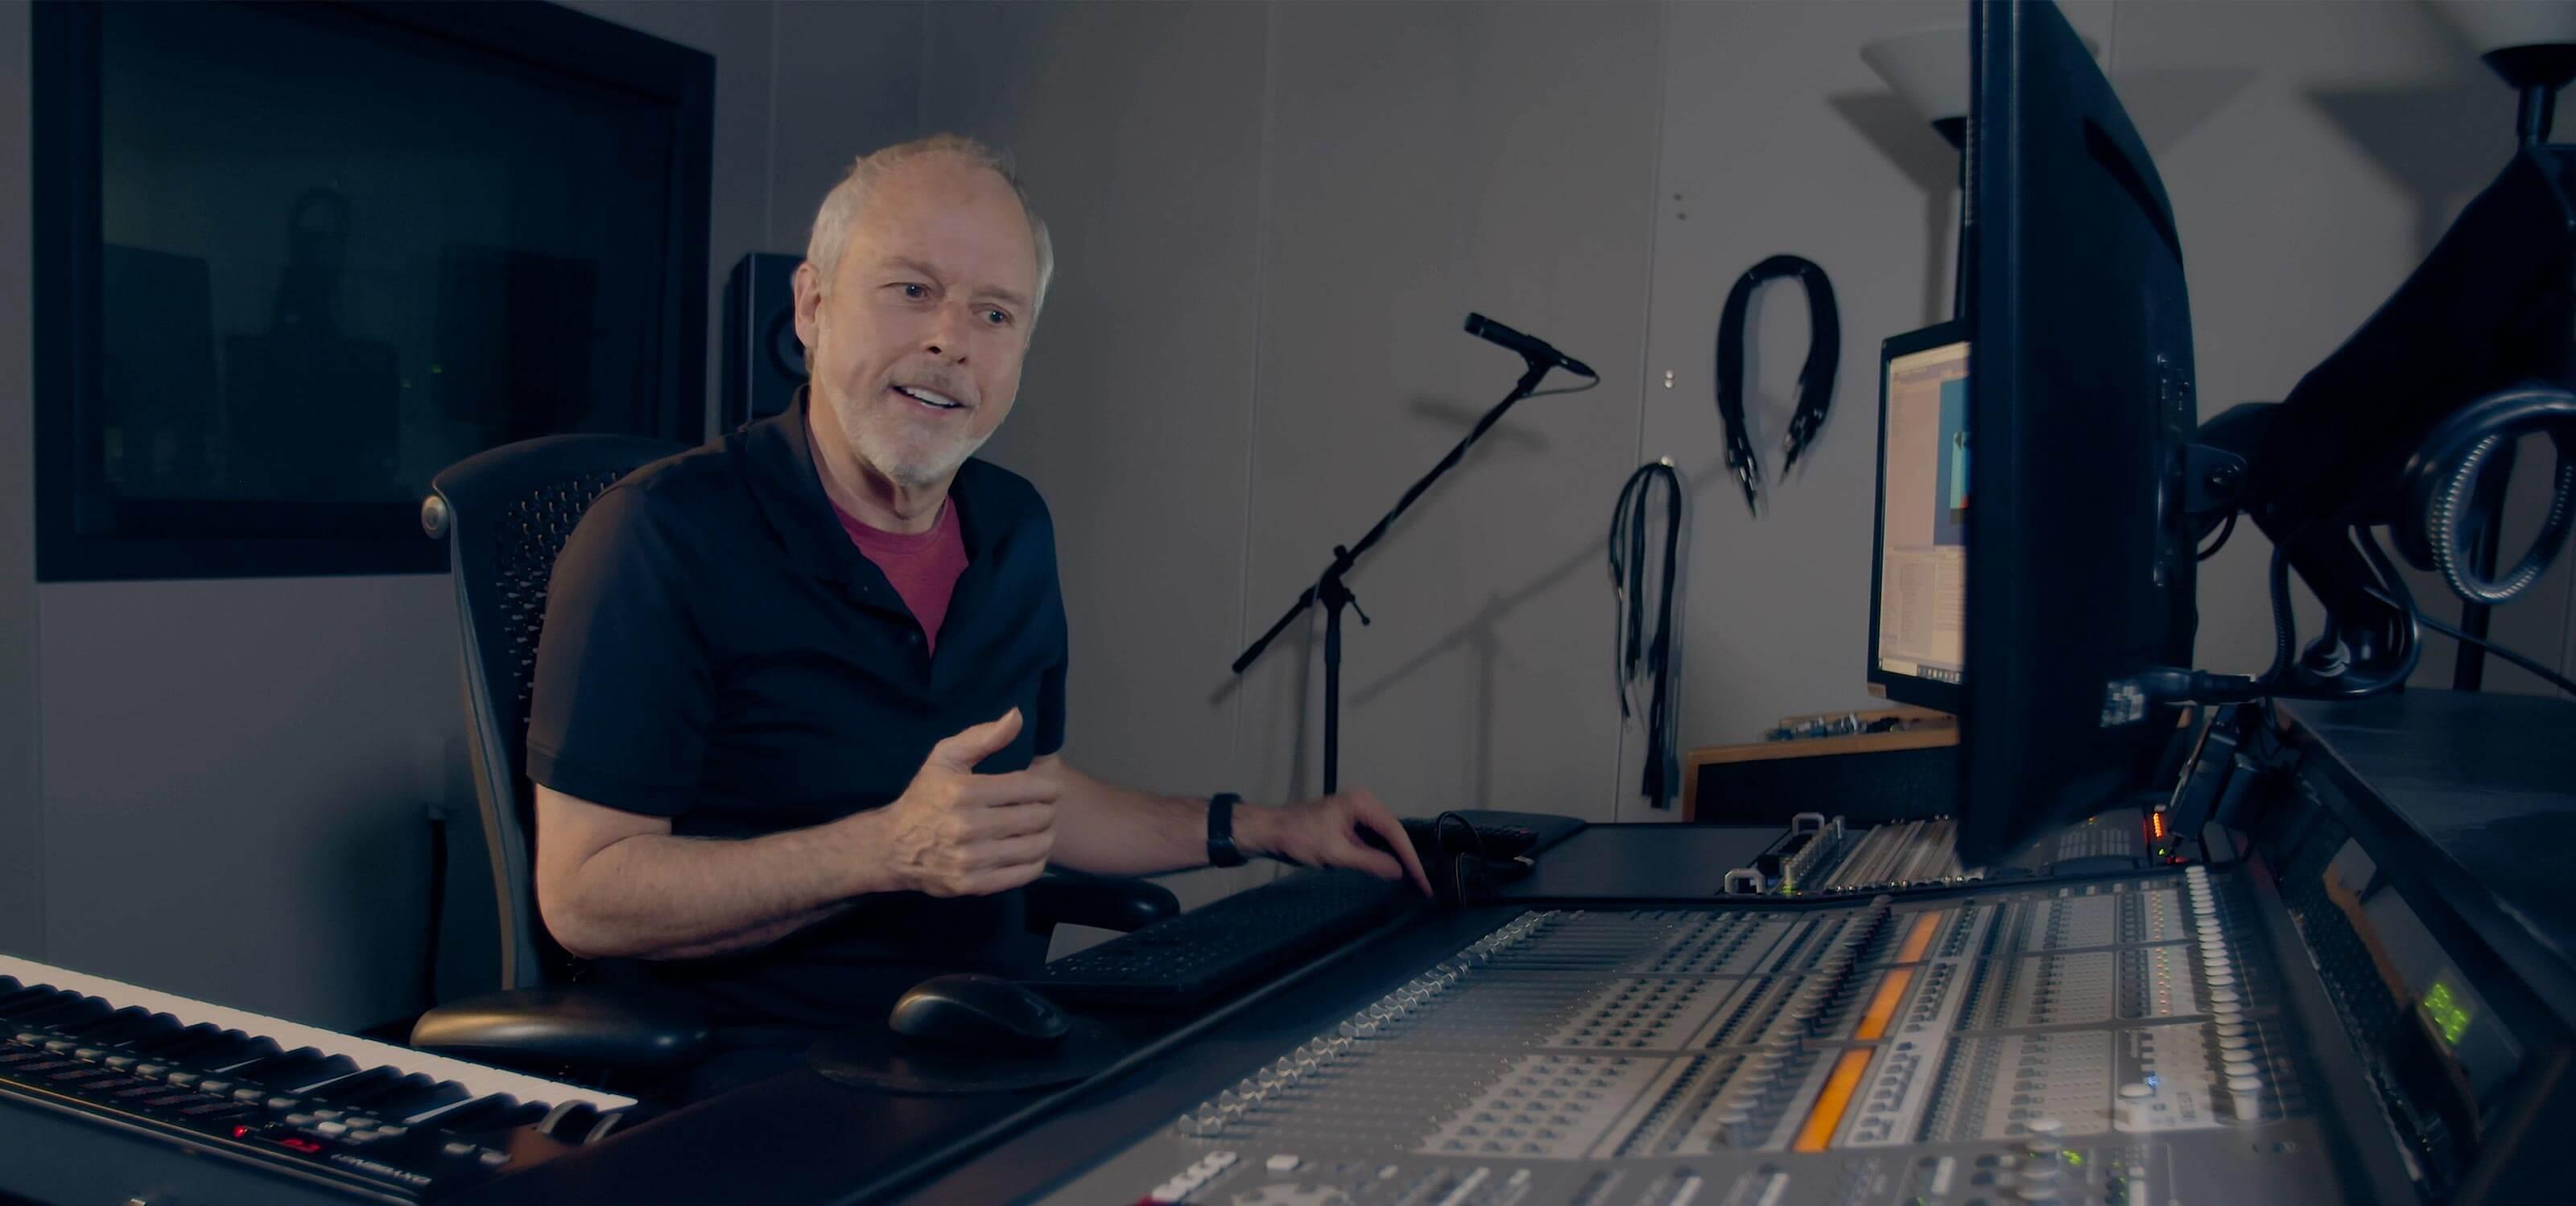 Lawrence Schwedler in the audio studio